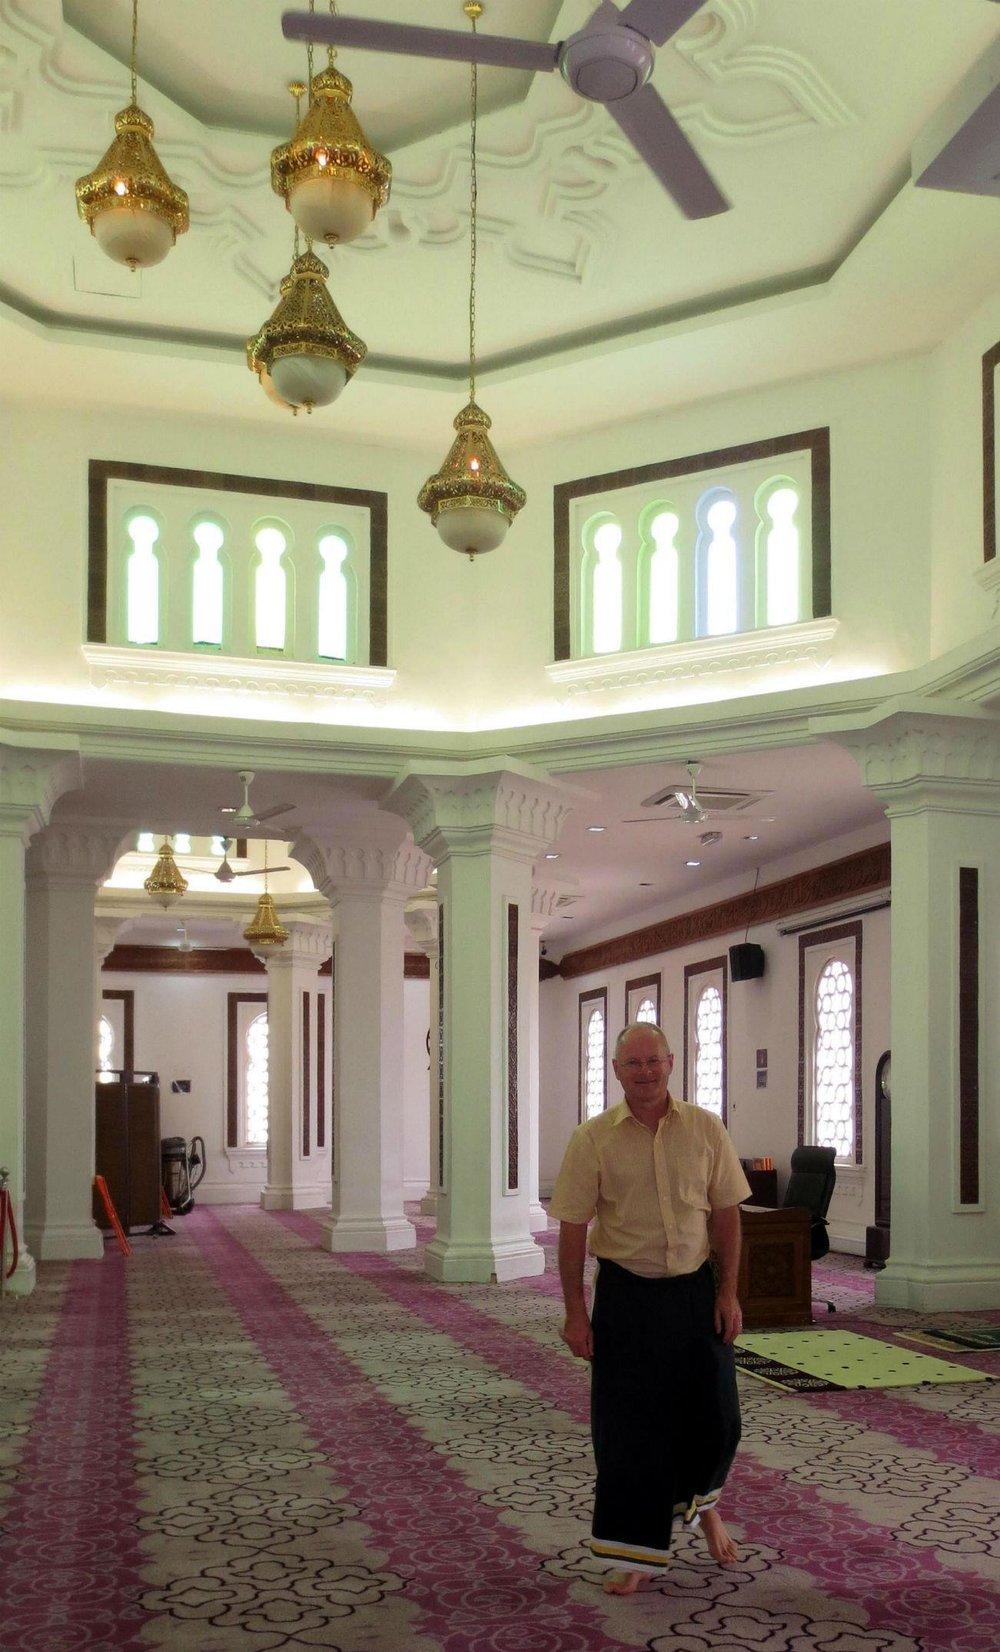 Masjid Jamek Mosque in Kuala Lumpur Central